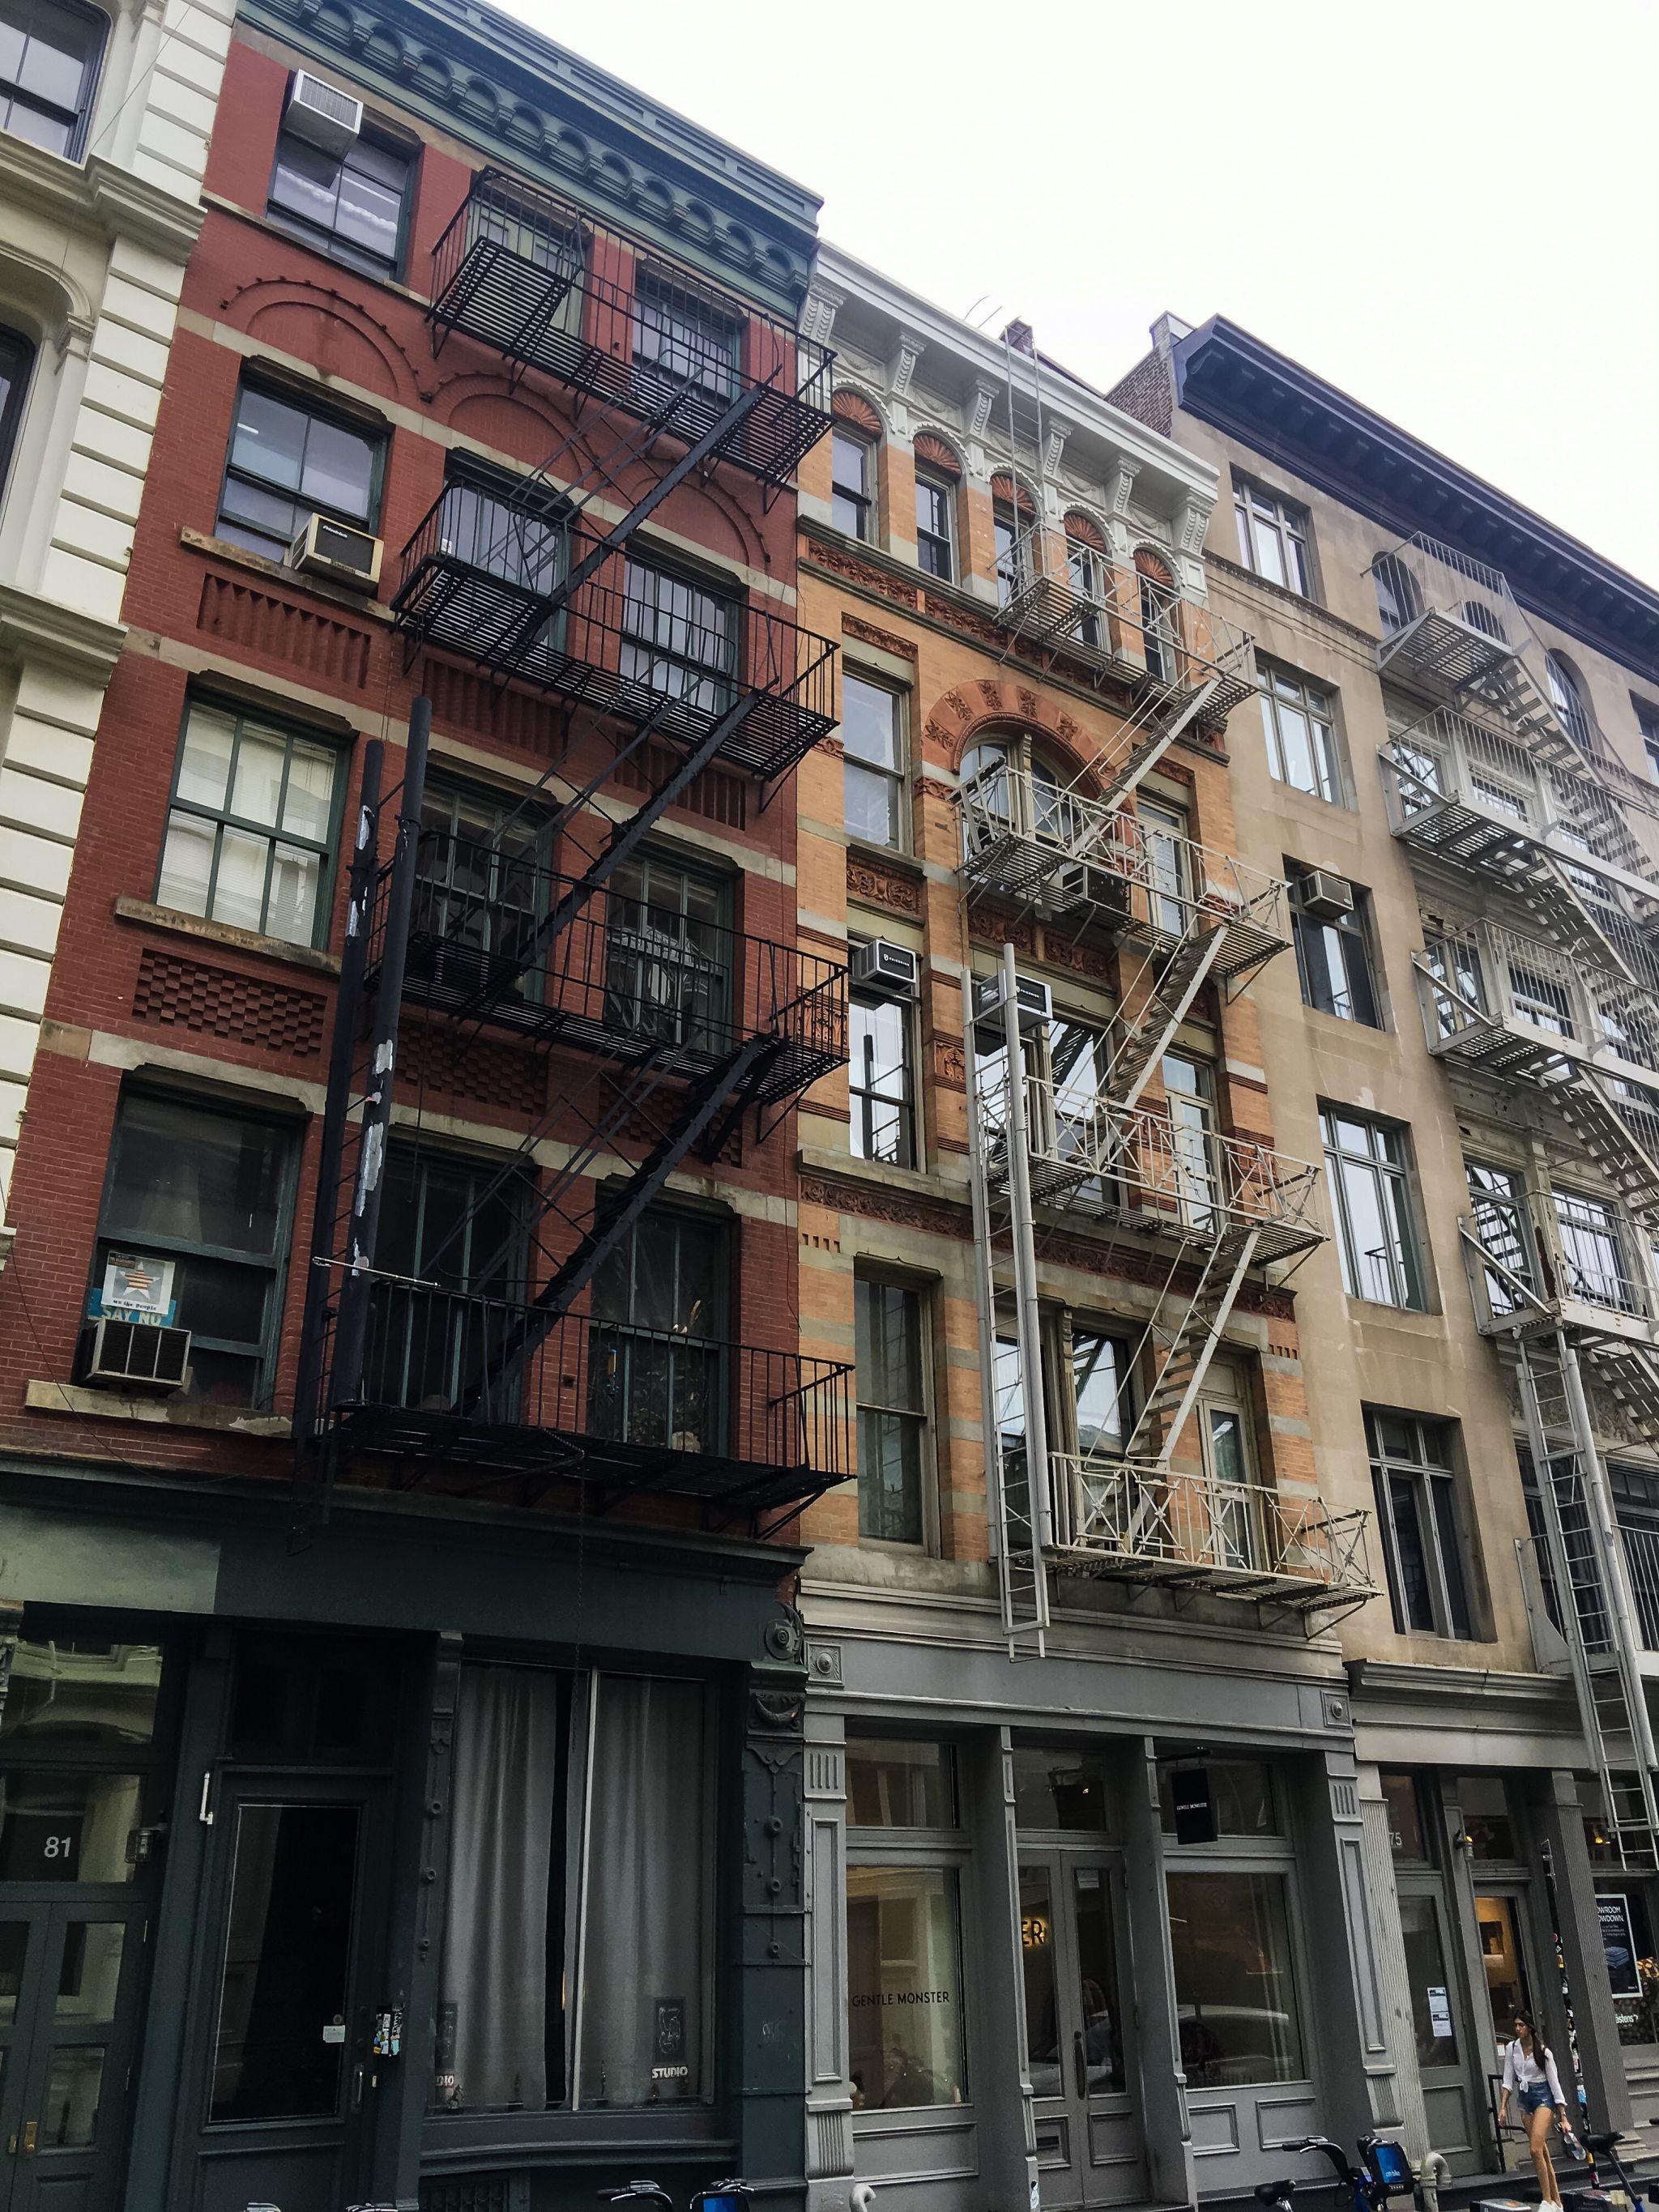 4 Tage in New York City - Häuser in SoHo - Nowshine Reiseblog ü 40